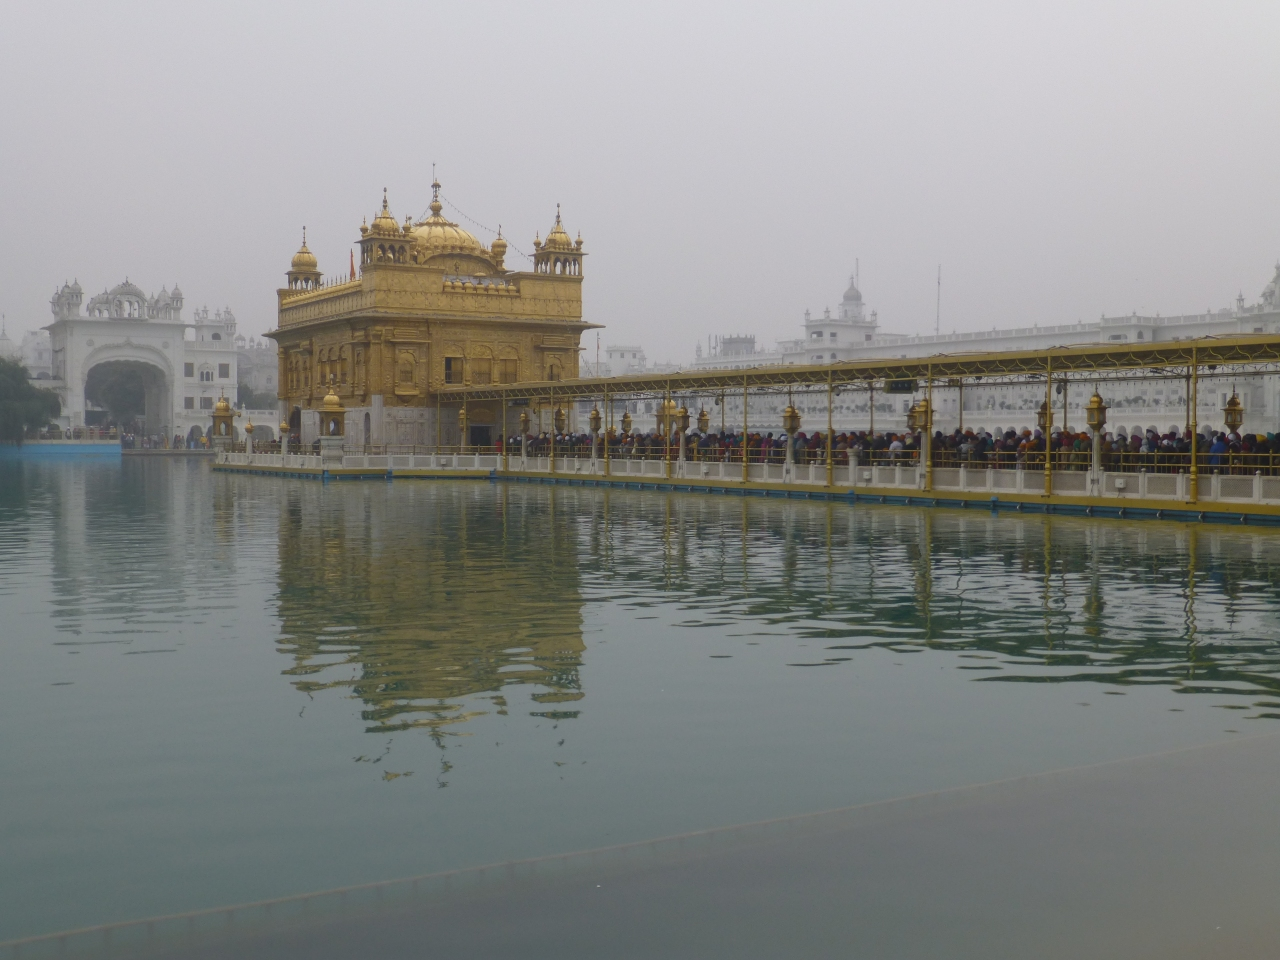 Amritsar: Heilige stad van desikhs